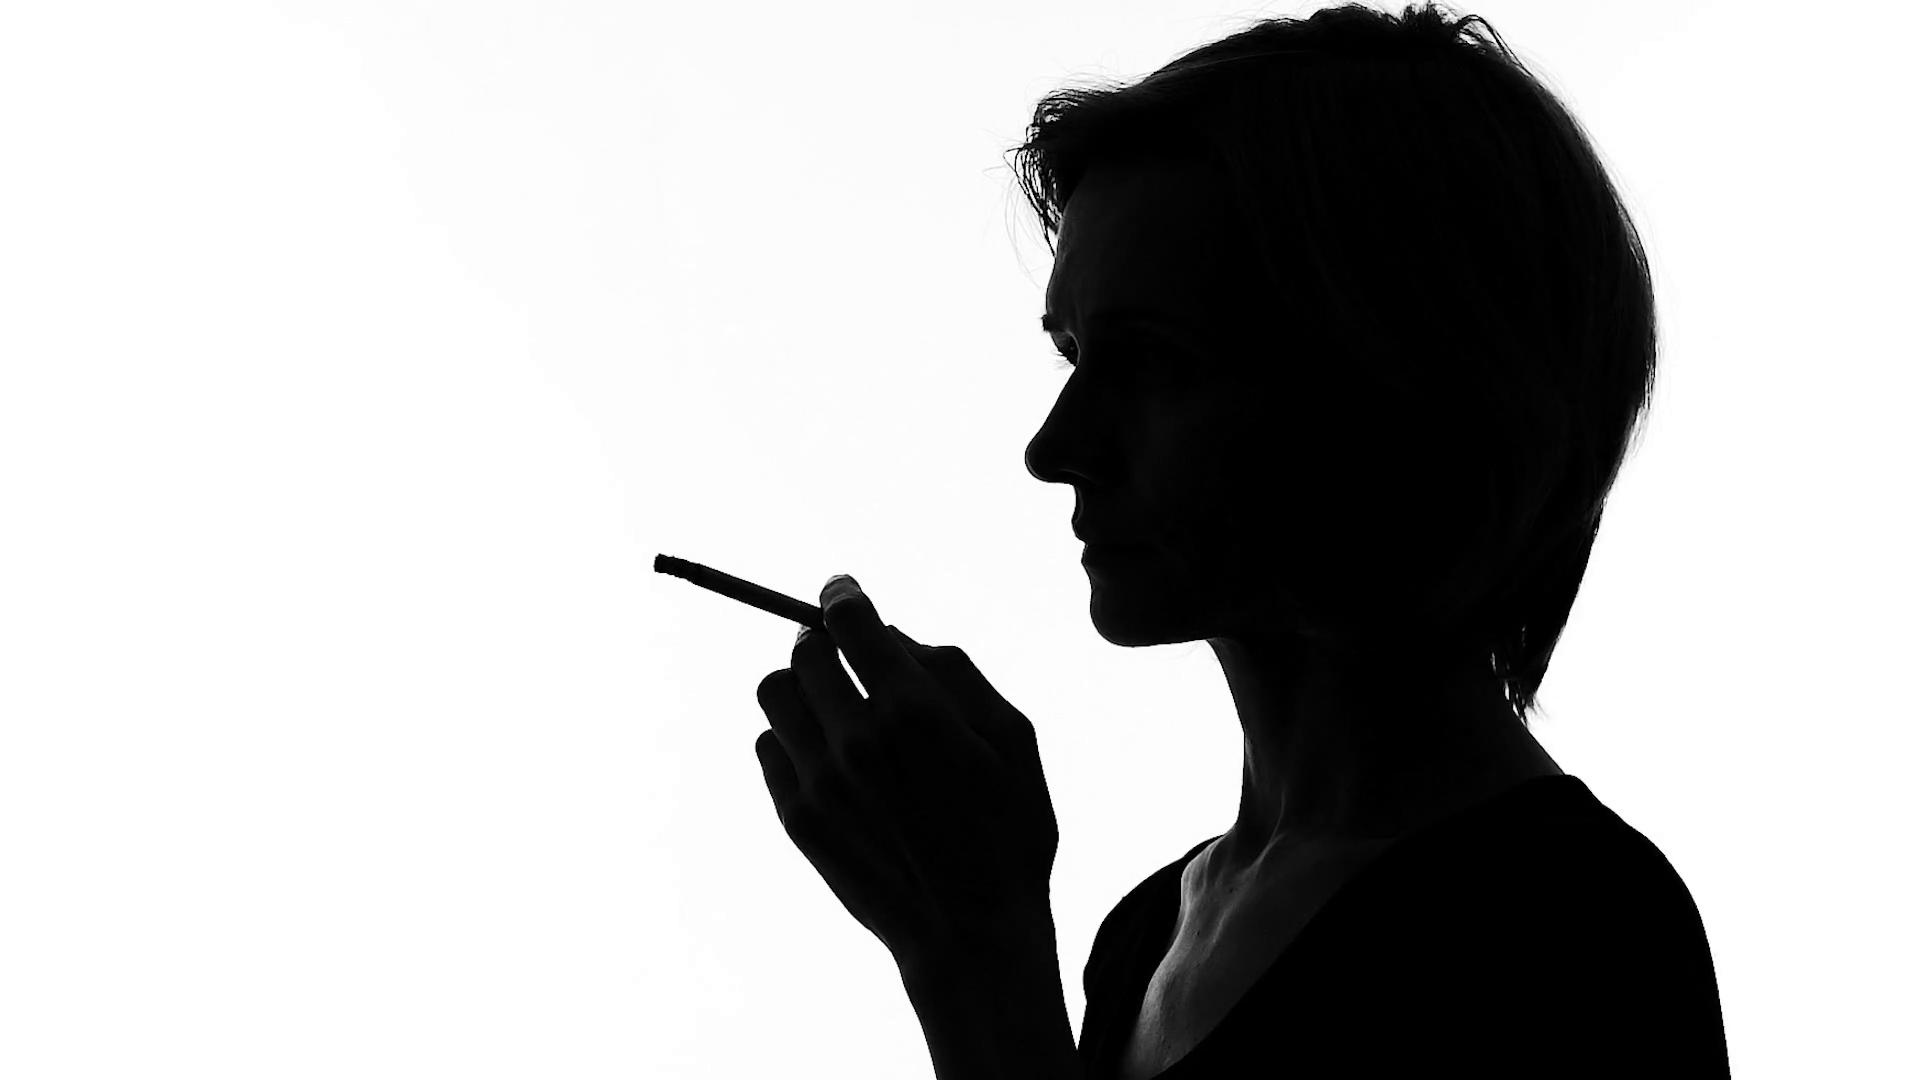 1920x1080 Sad Woman Drinking Wine And Smoking, Dangerous Habit Addiction